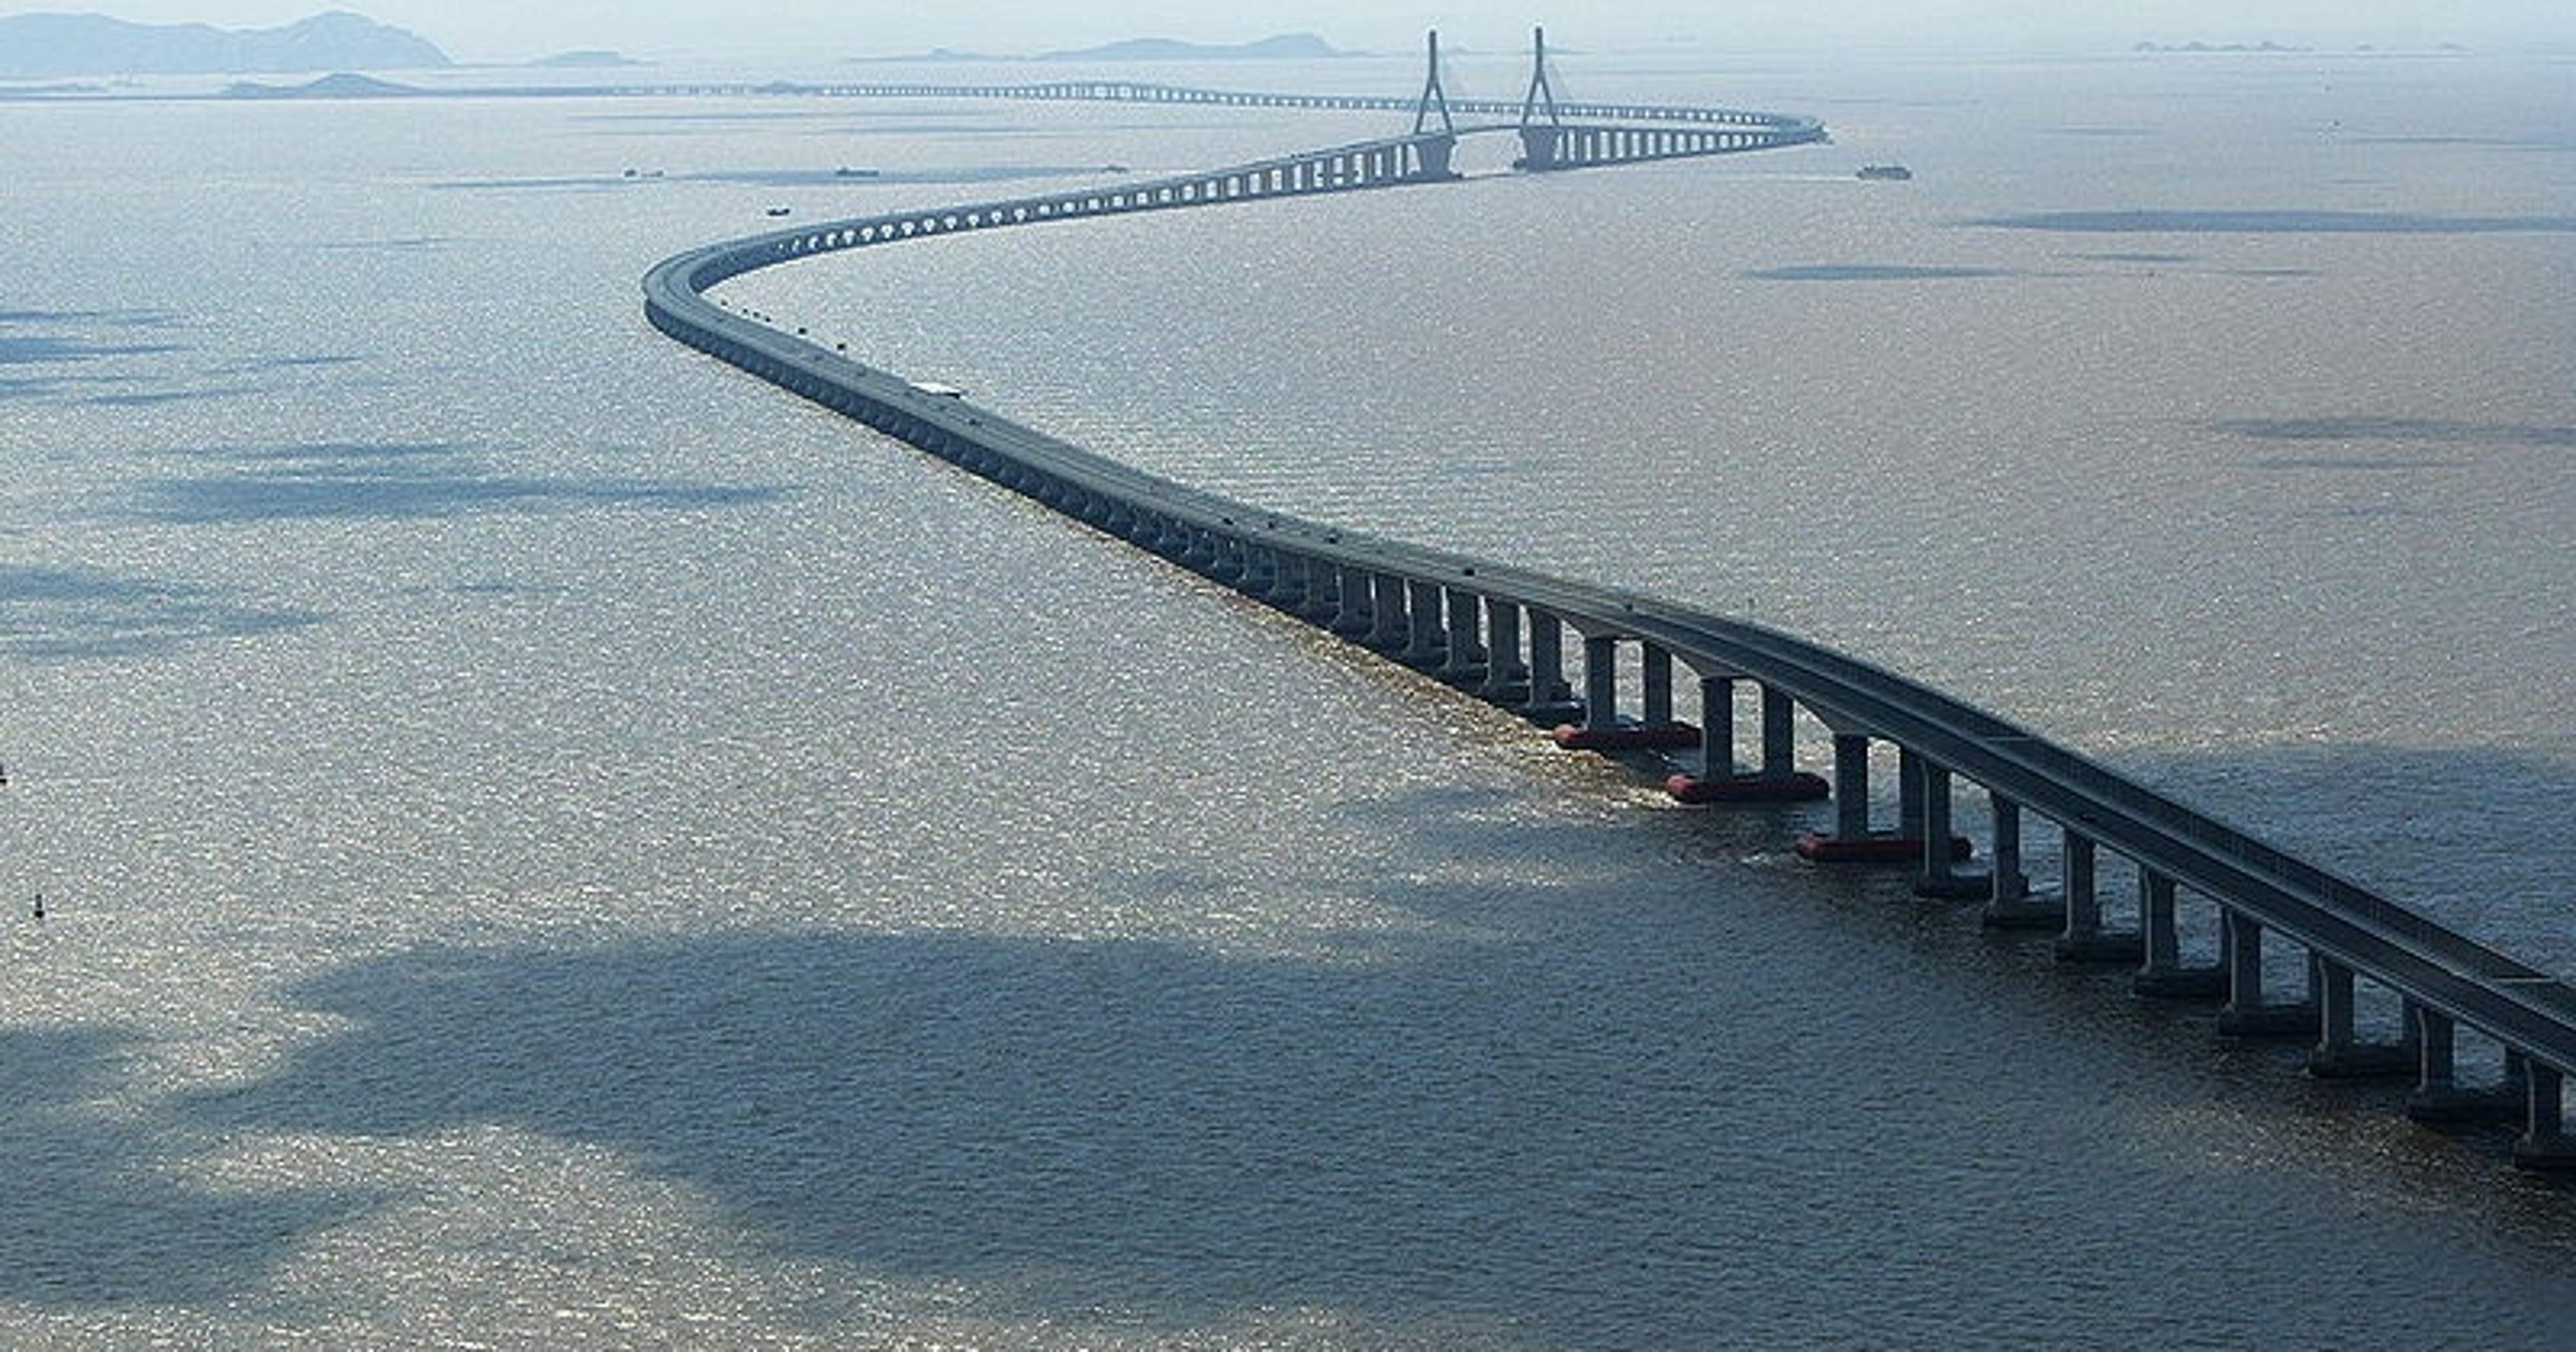 10 longest bridges to drive across